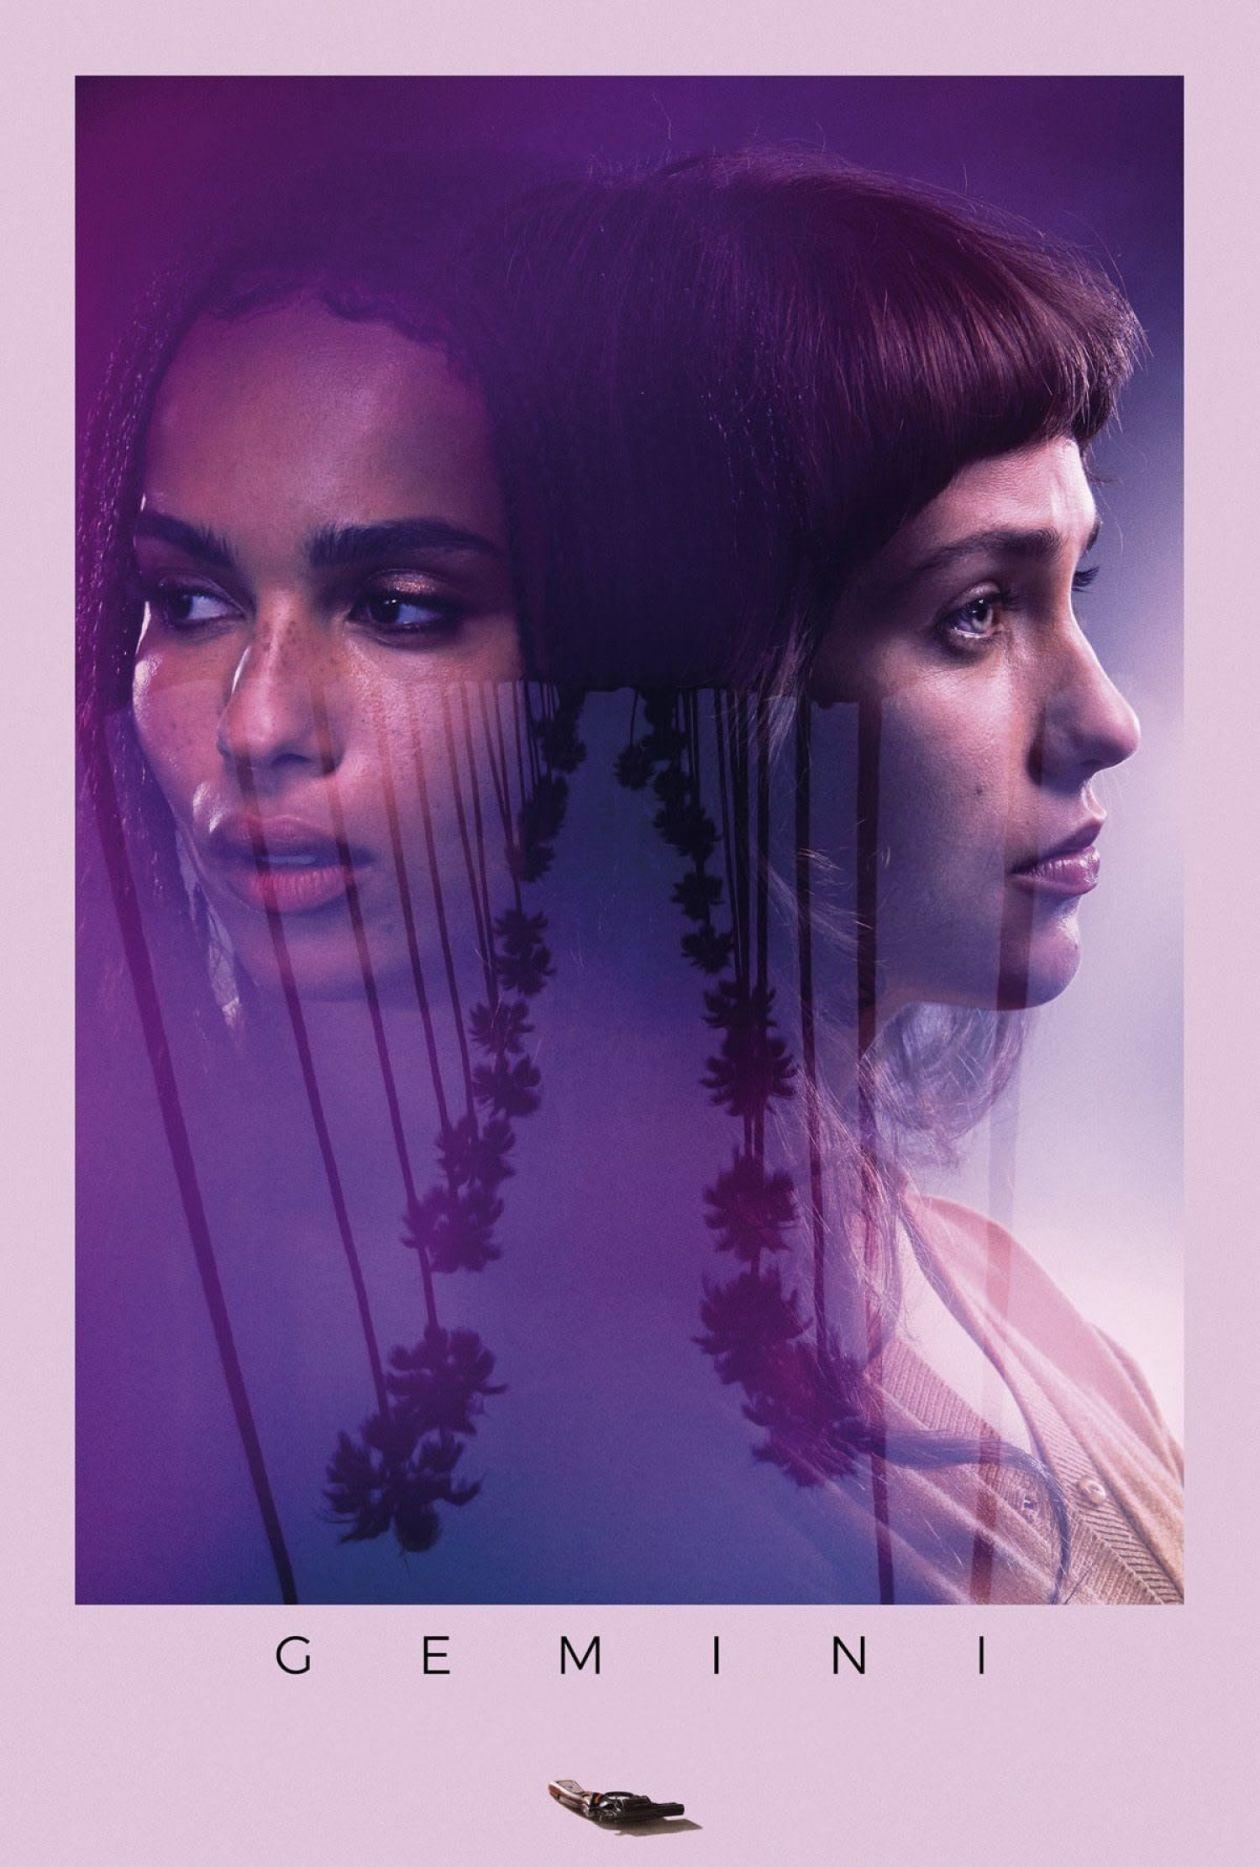 Zoë Kravitz / Lola Kirke actresses | GEMINI | Aaron Katz 2017 Movie Poster Affiche film